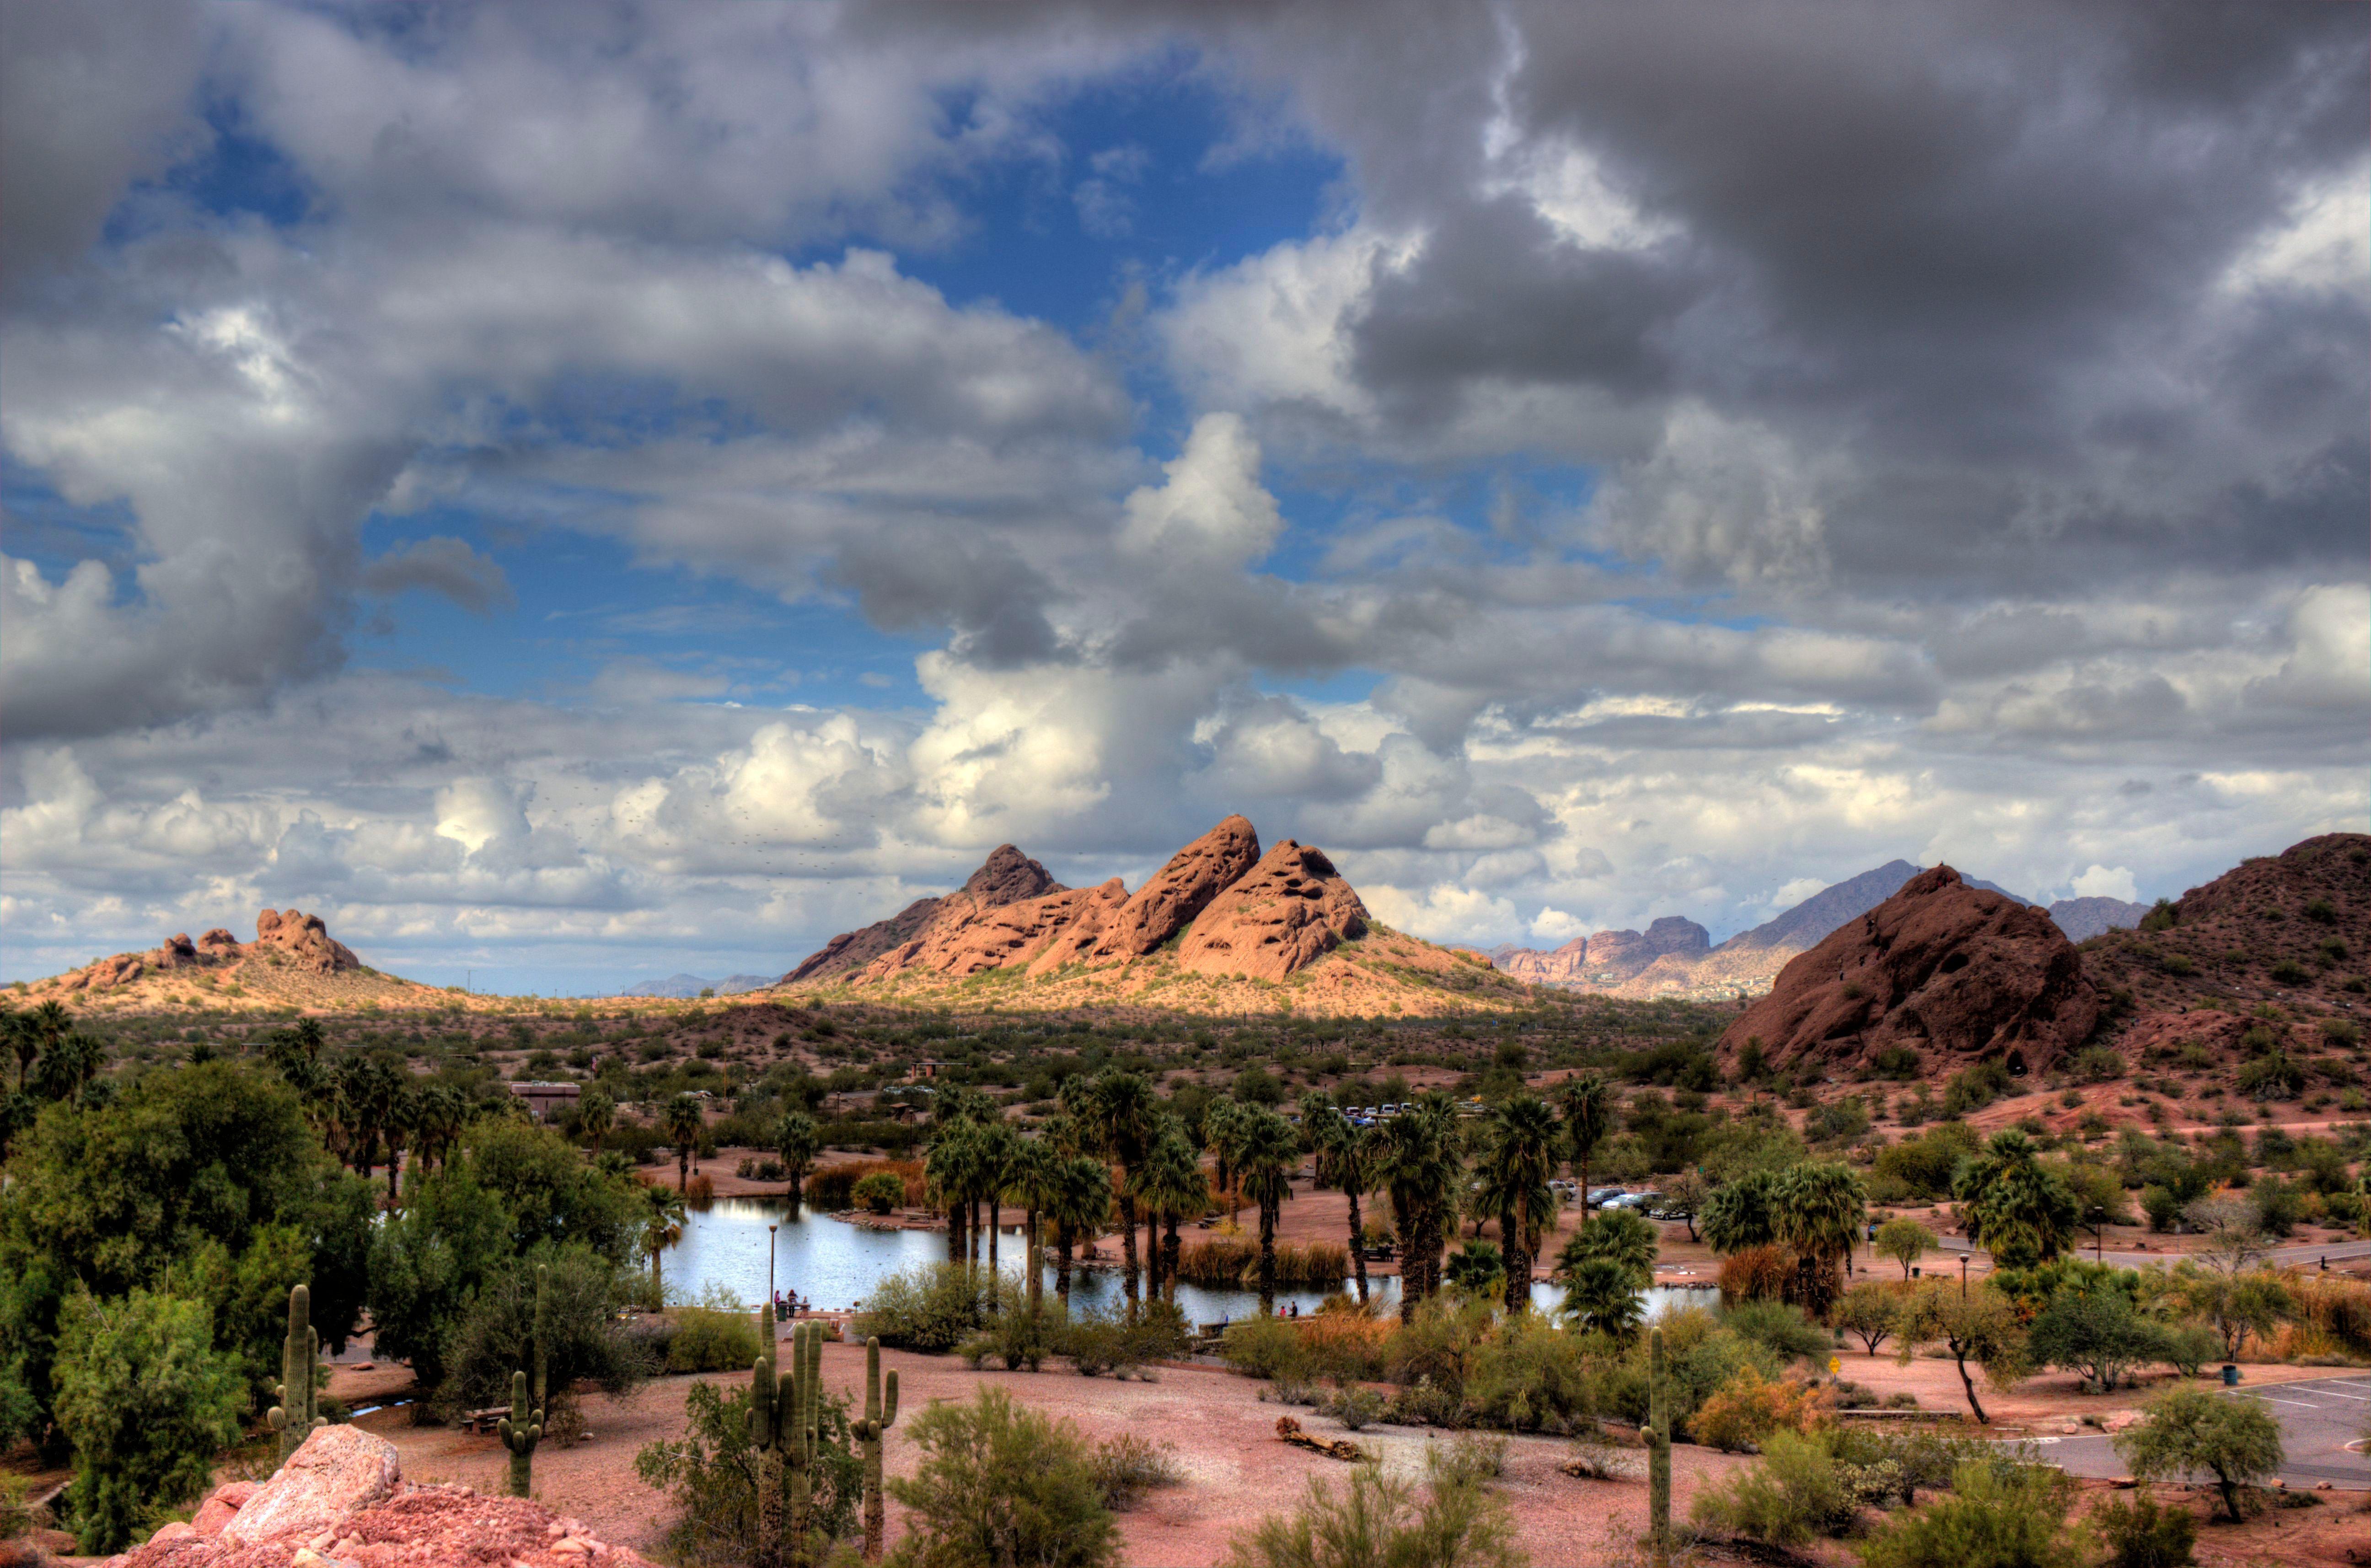 Landscape of Papago Park in Phoenix